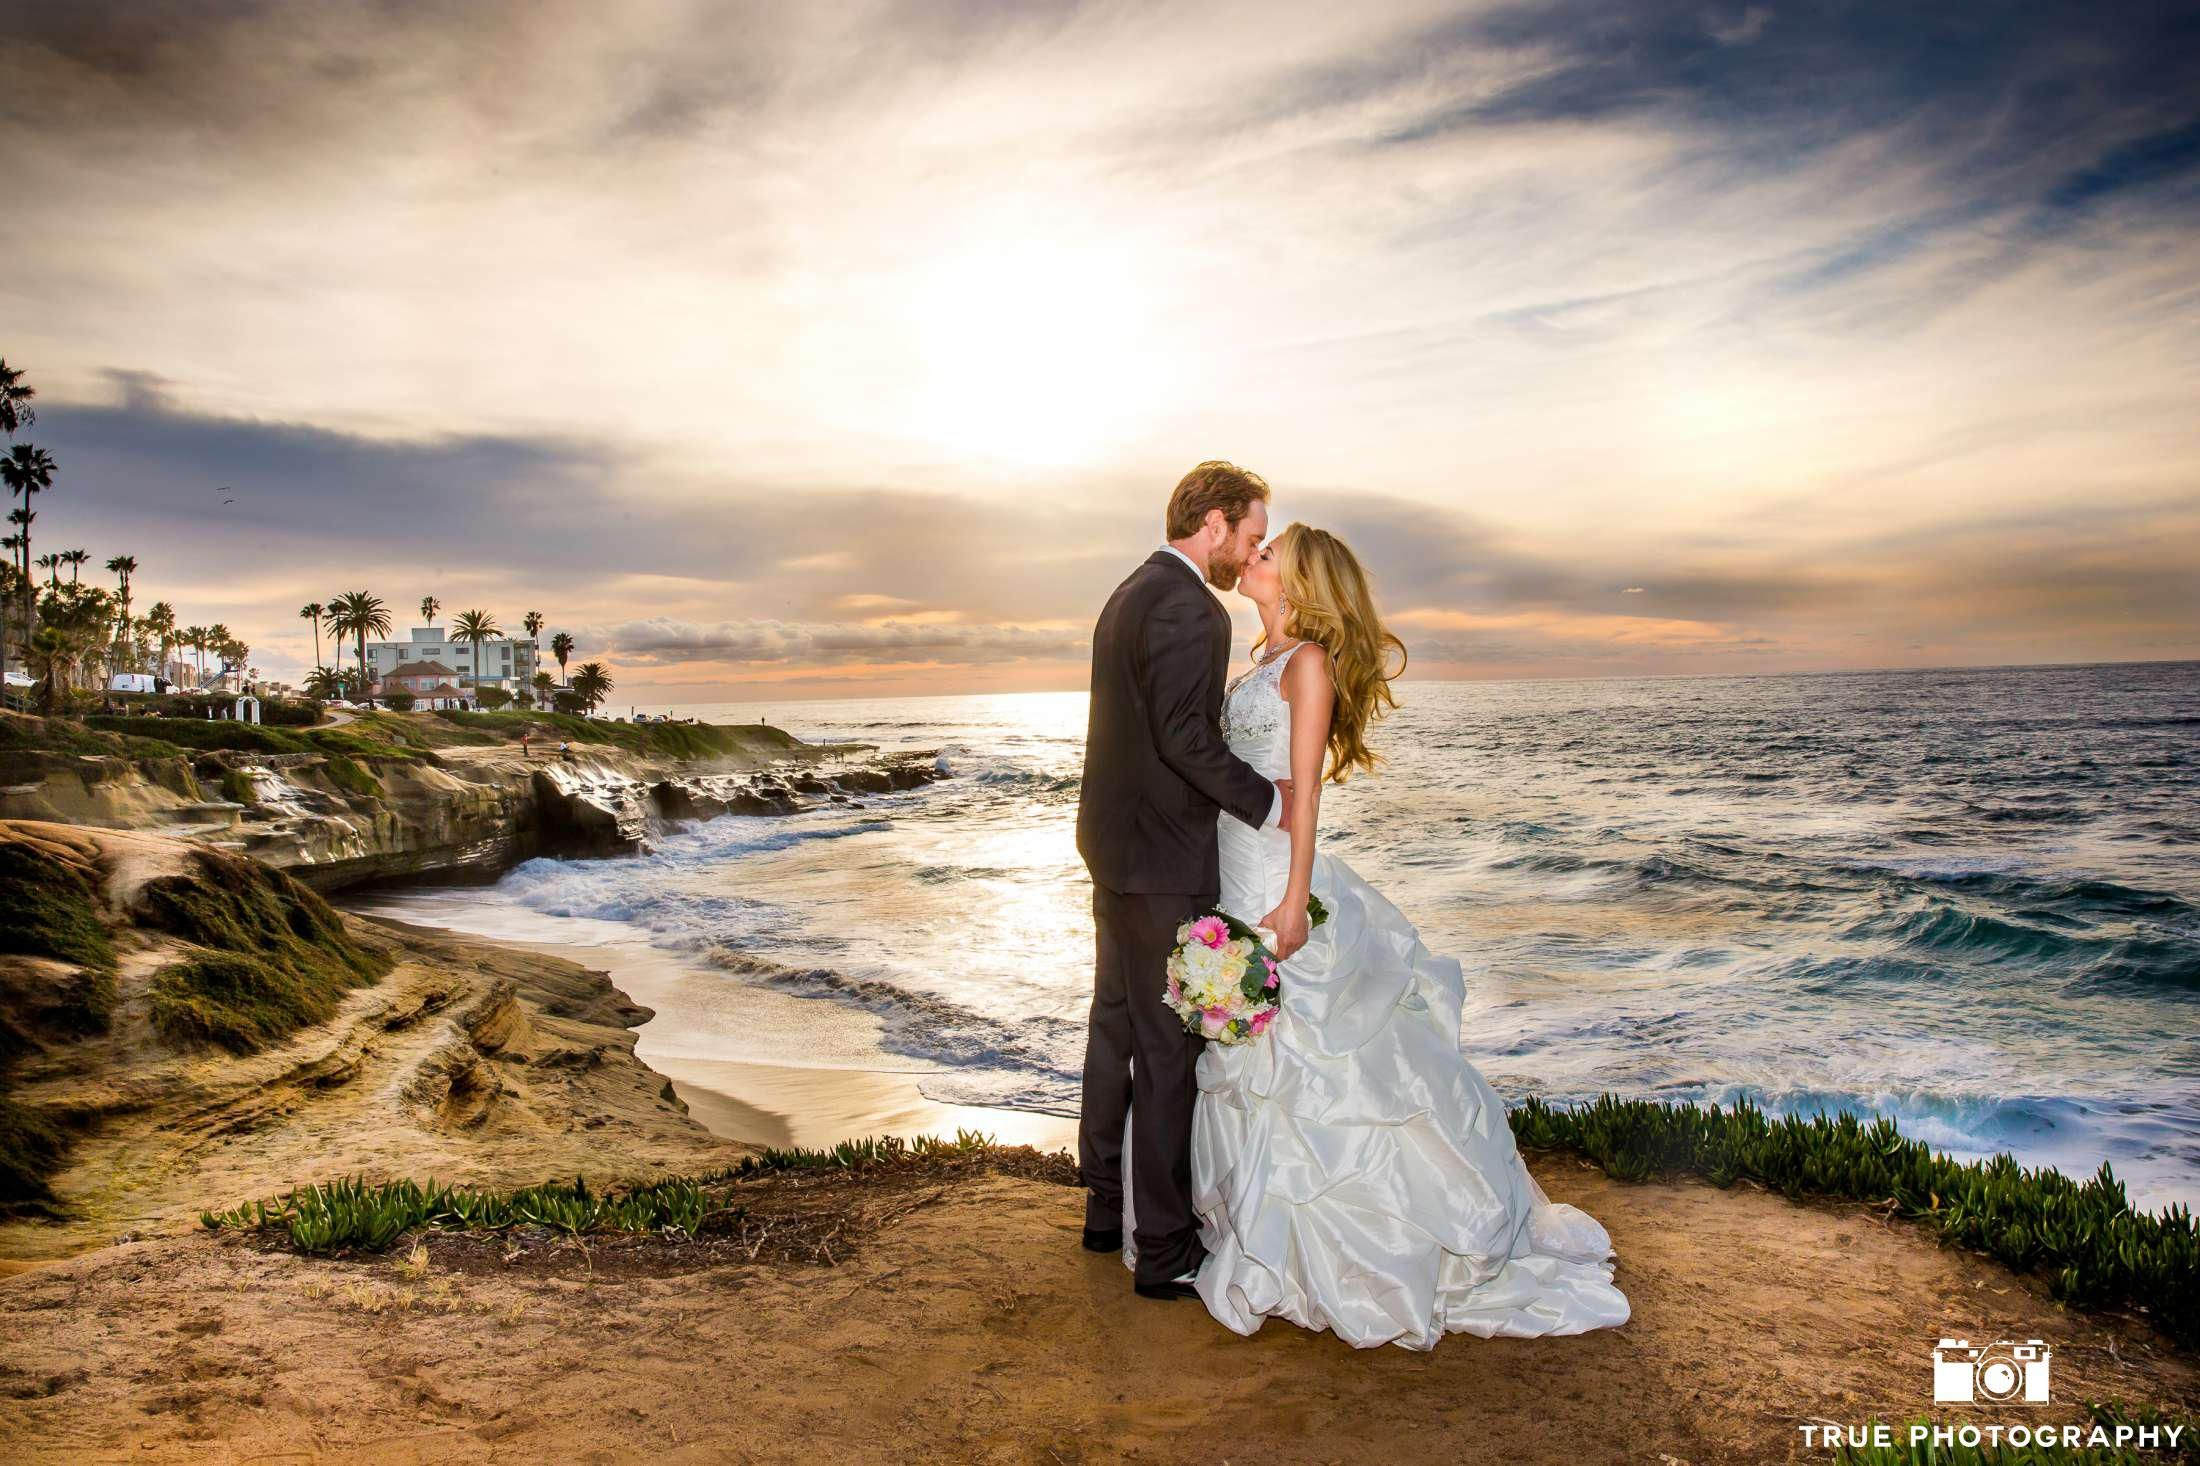 Beach wedding venues in san diego  Experience San Diegous  wedding venue for private events beach